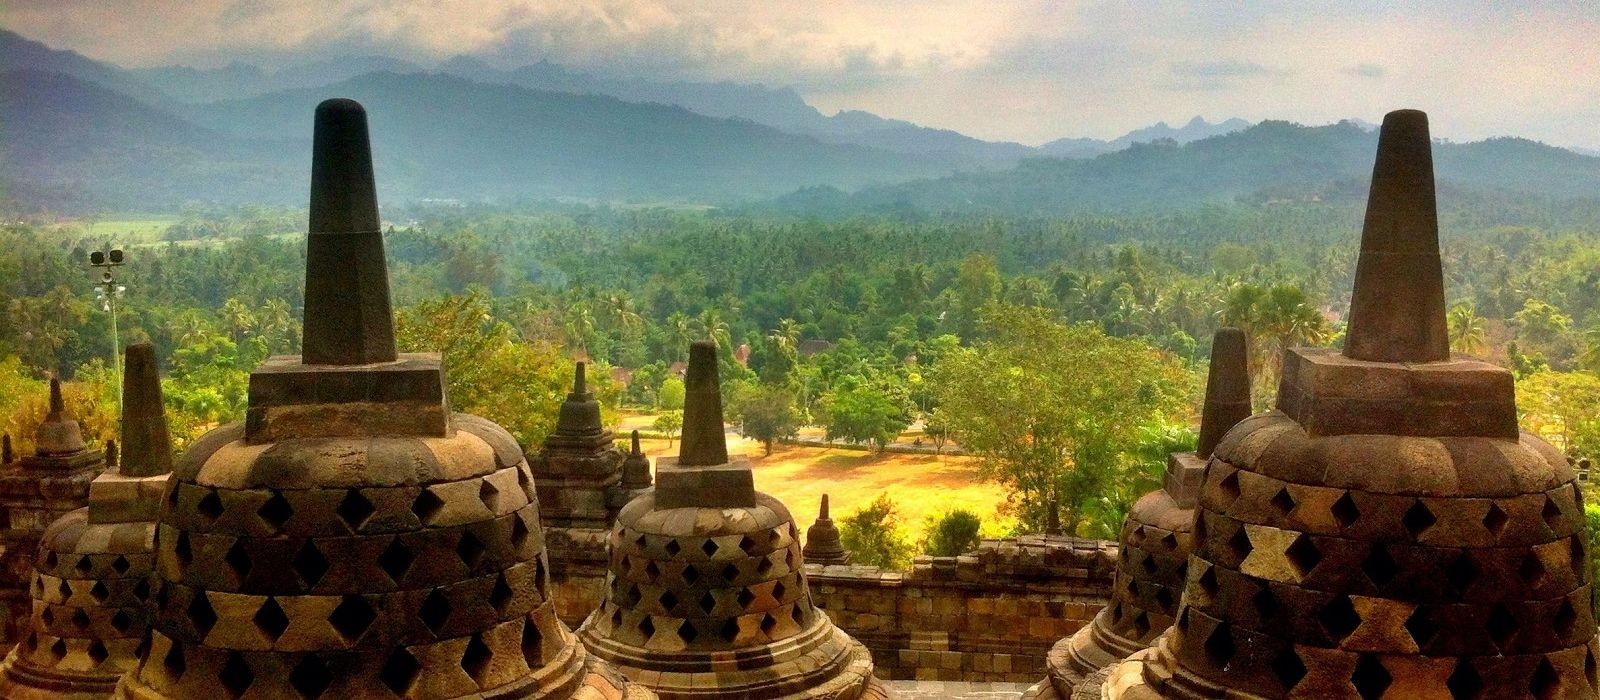 Festive Special: Indonesia's Timeless Landscapes and Unique Culture Tour Trip 3